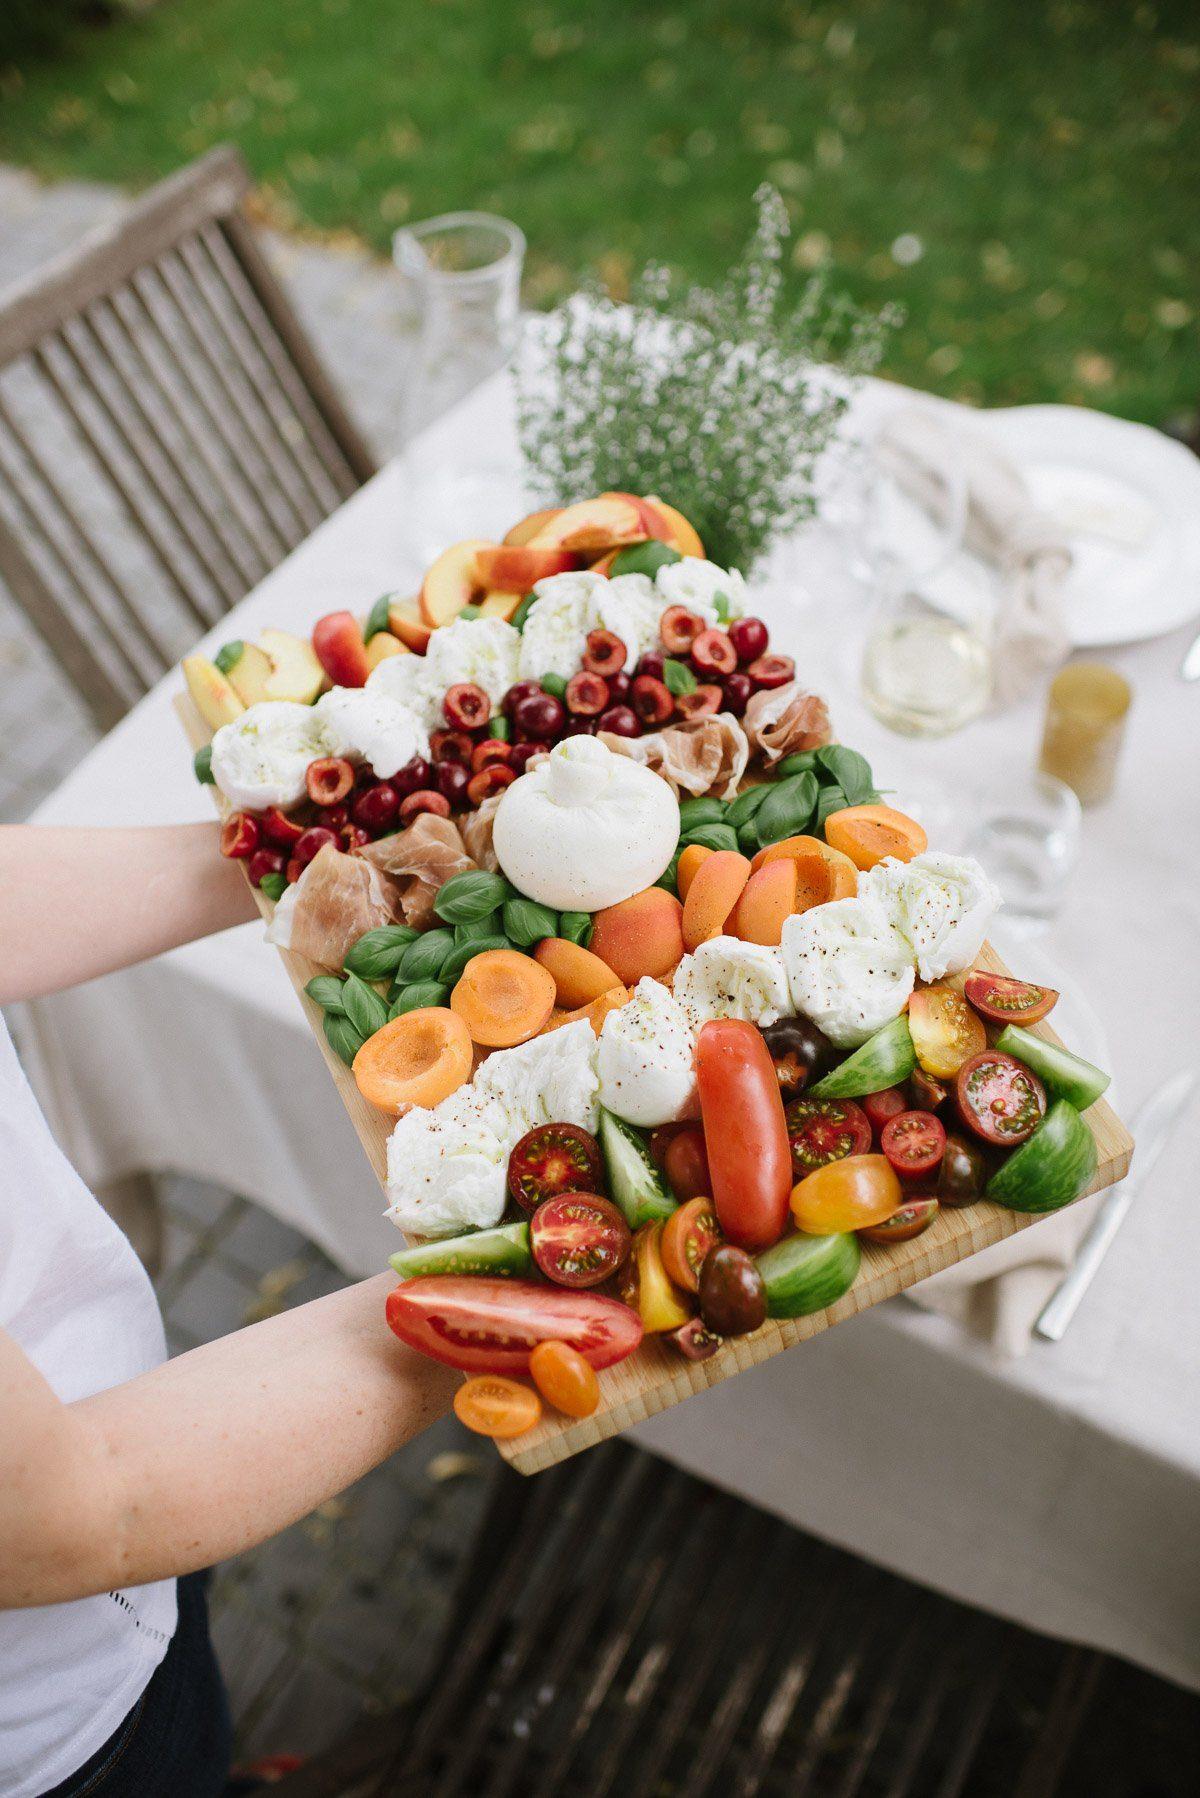 Antipasti Platte mit Tomaten, Schinken & Mozarella